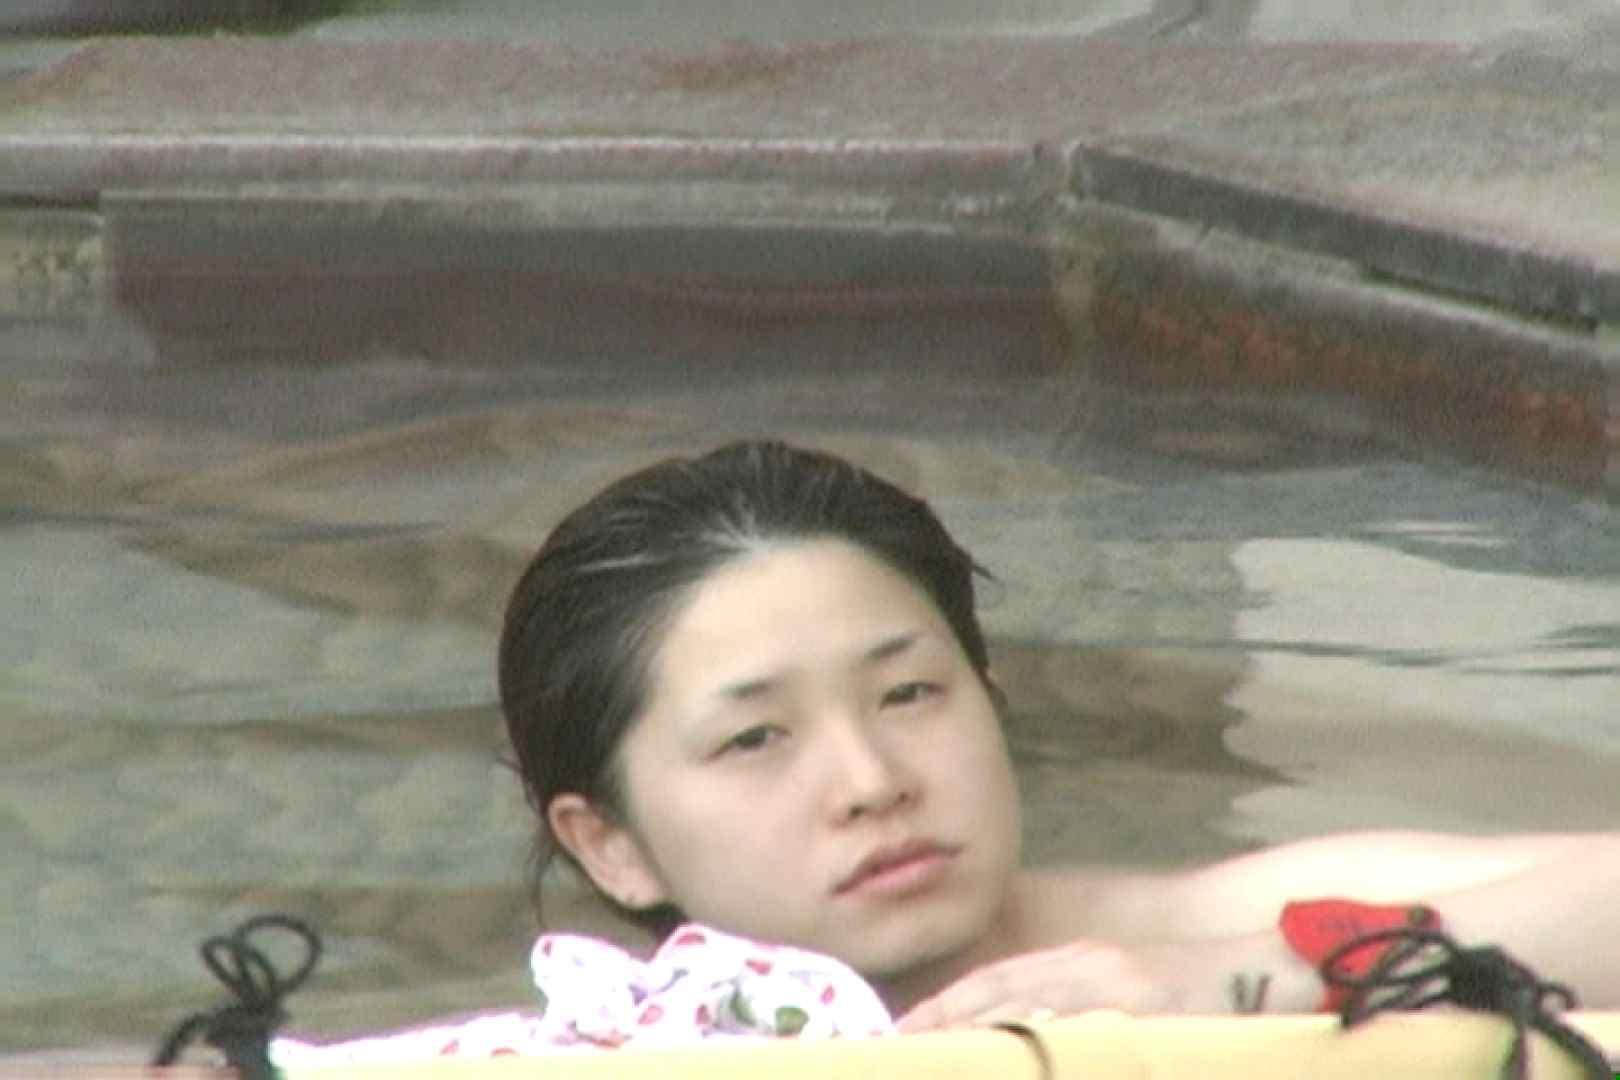 Aquaな露天風呂Vol.628 0  90連発 24